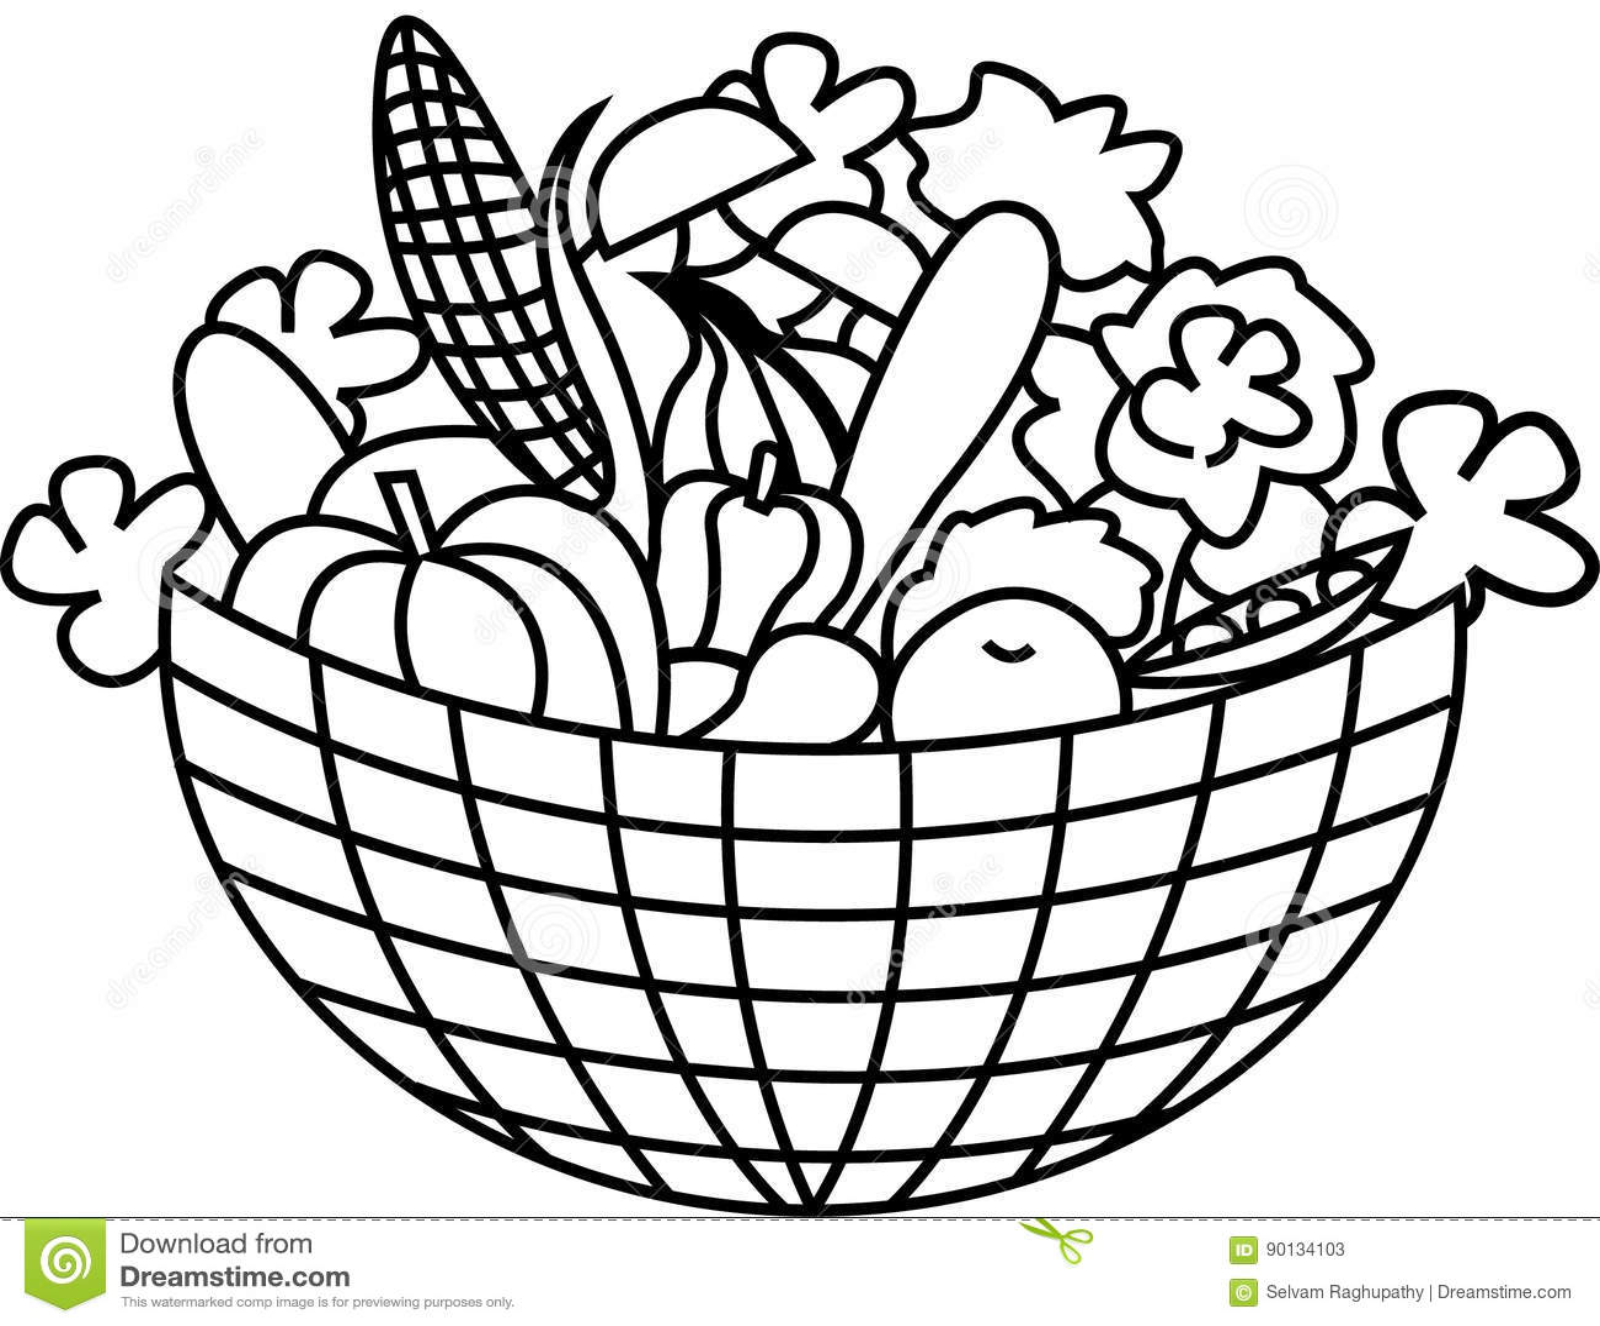 Vegetables In A Basket Stock Vector Illustration Of